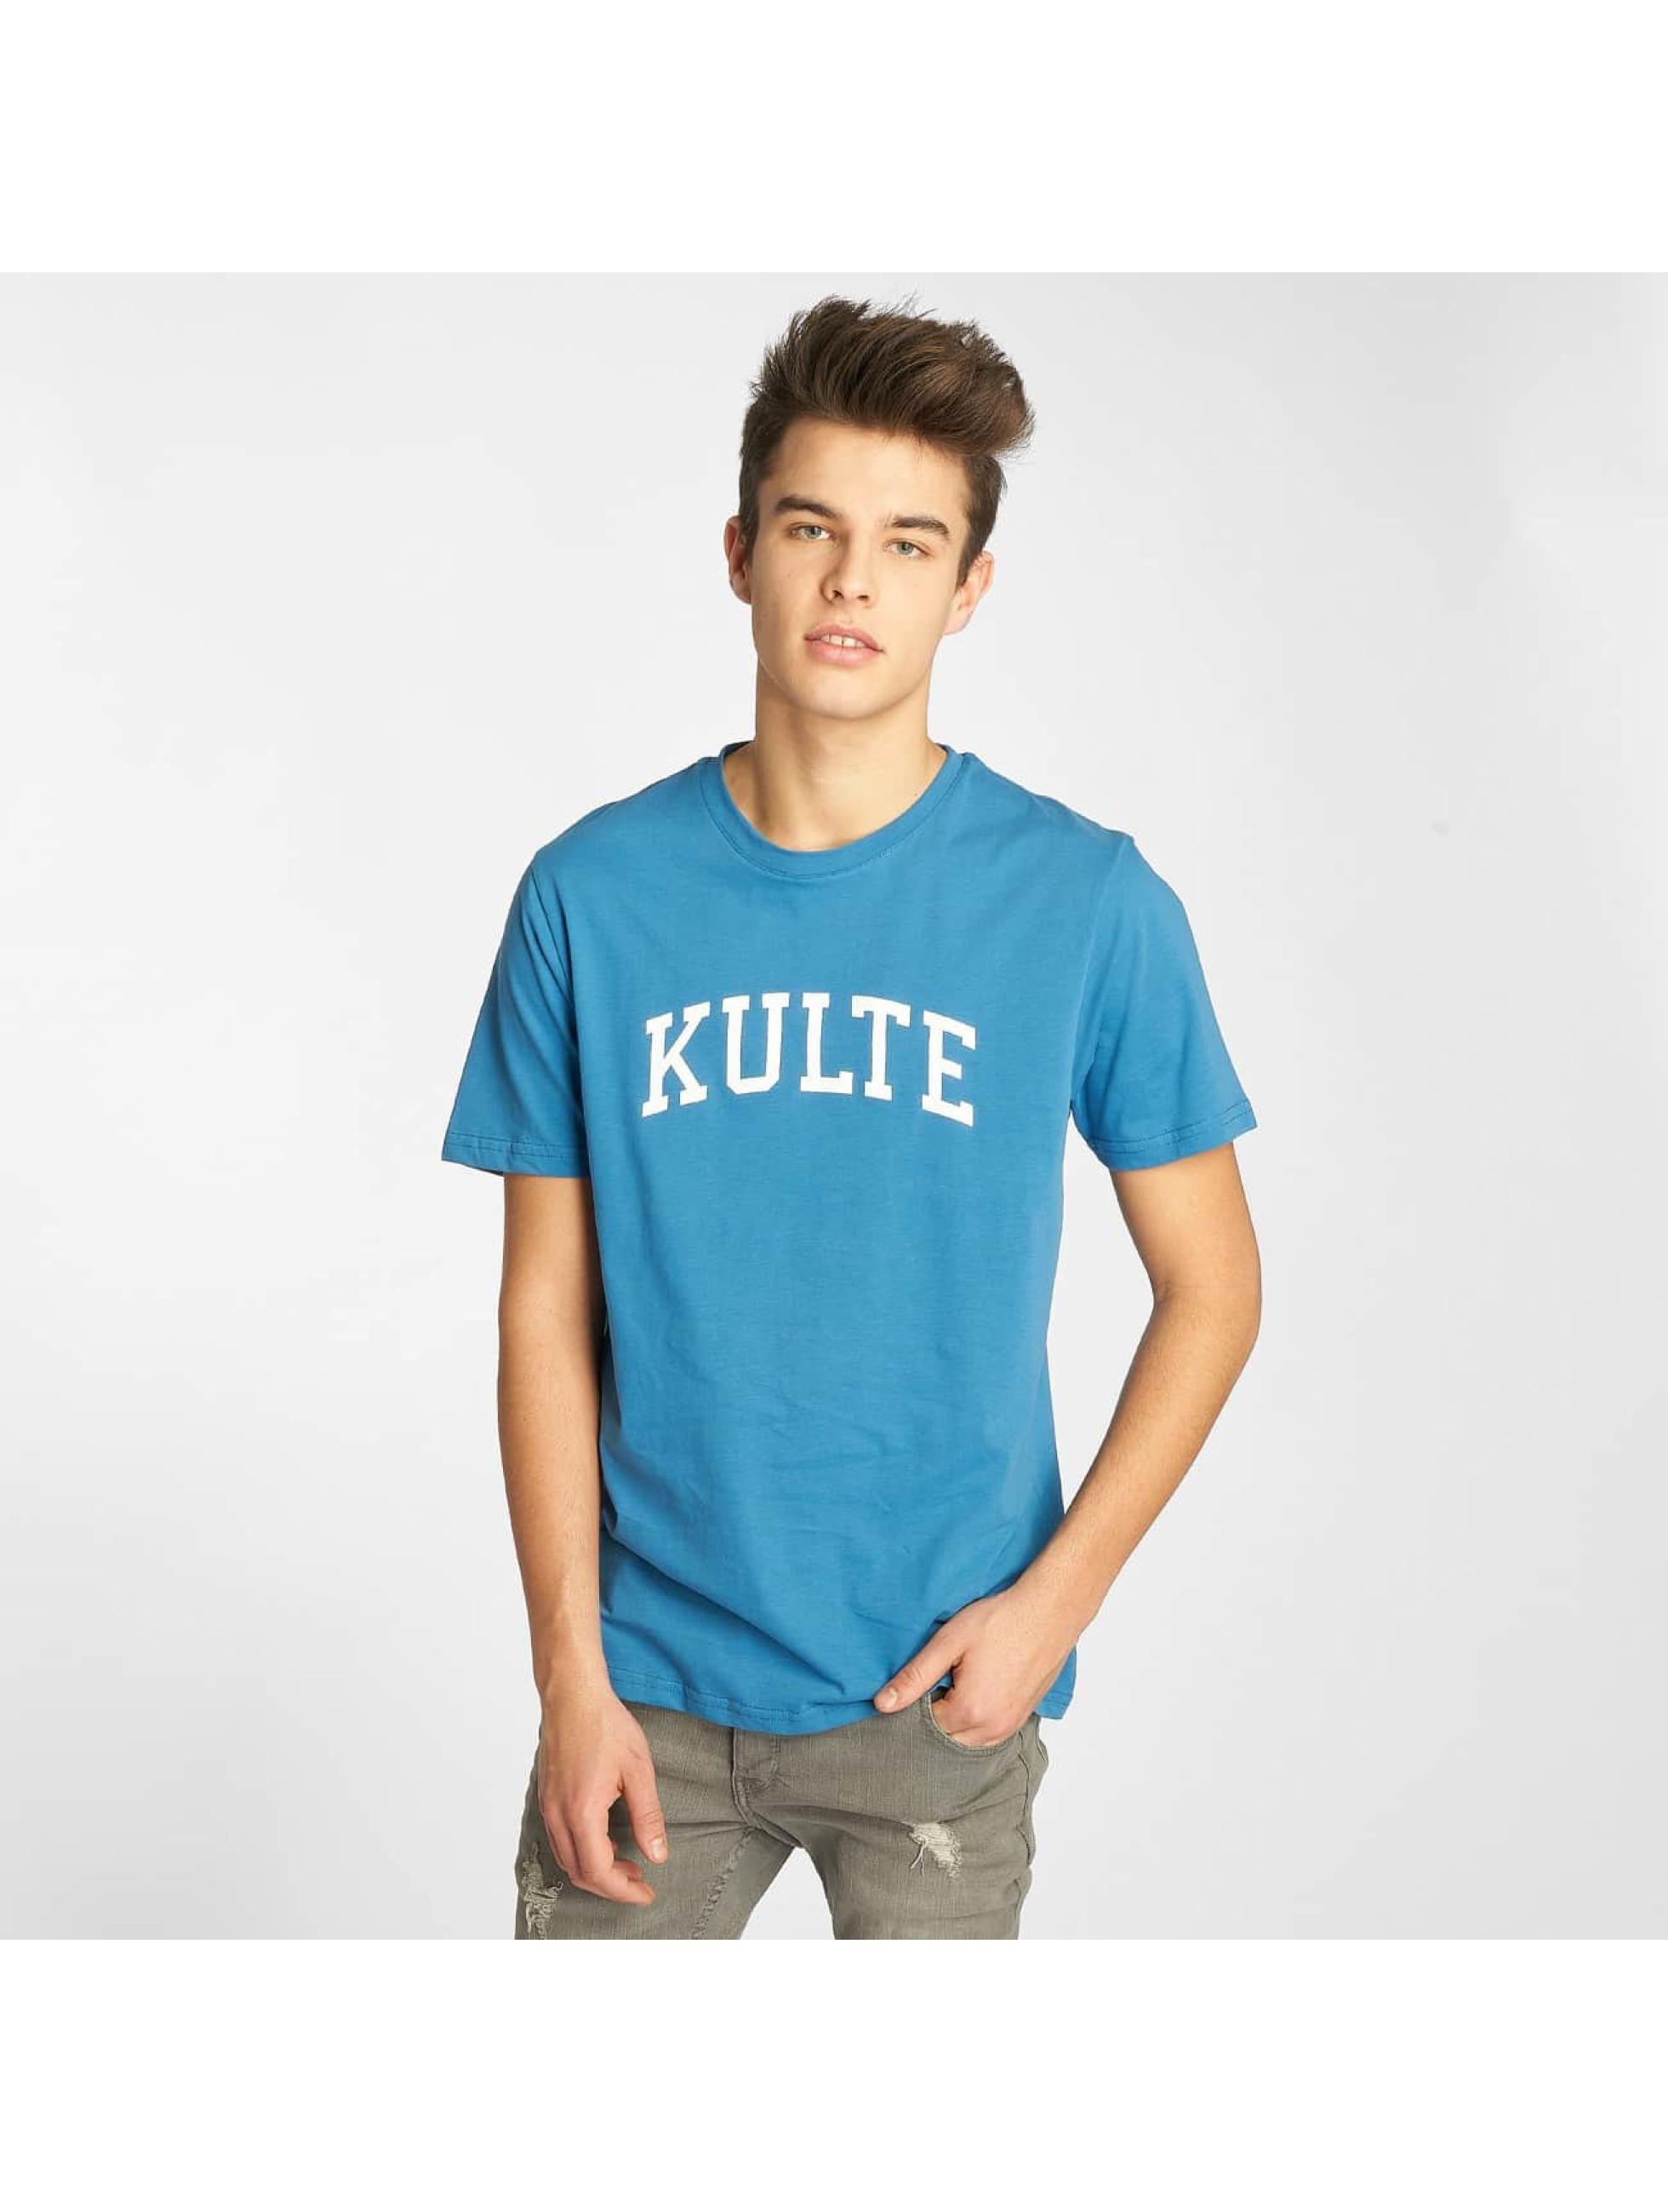 Kulte T-shirt Corpo College blu